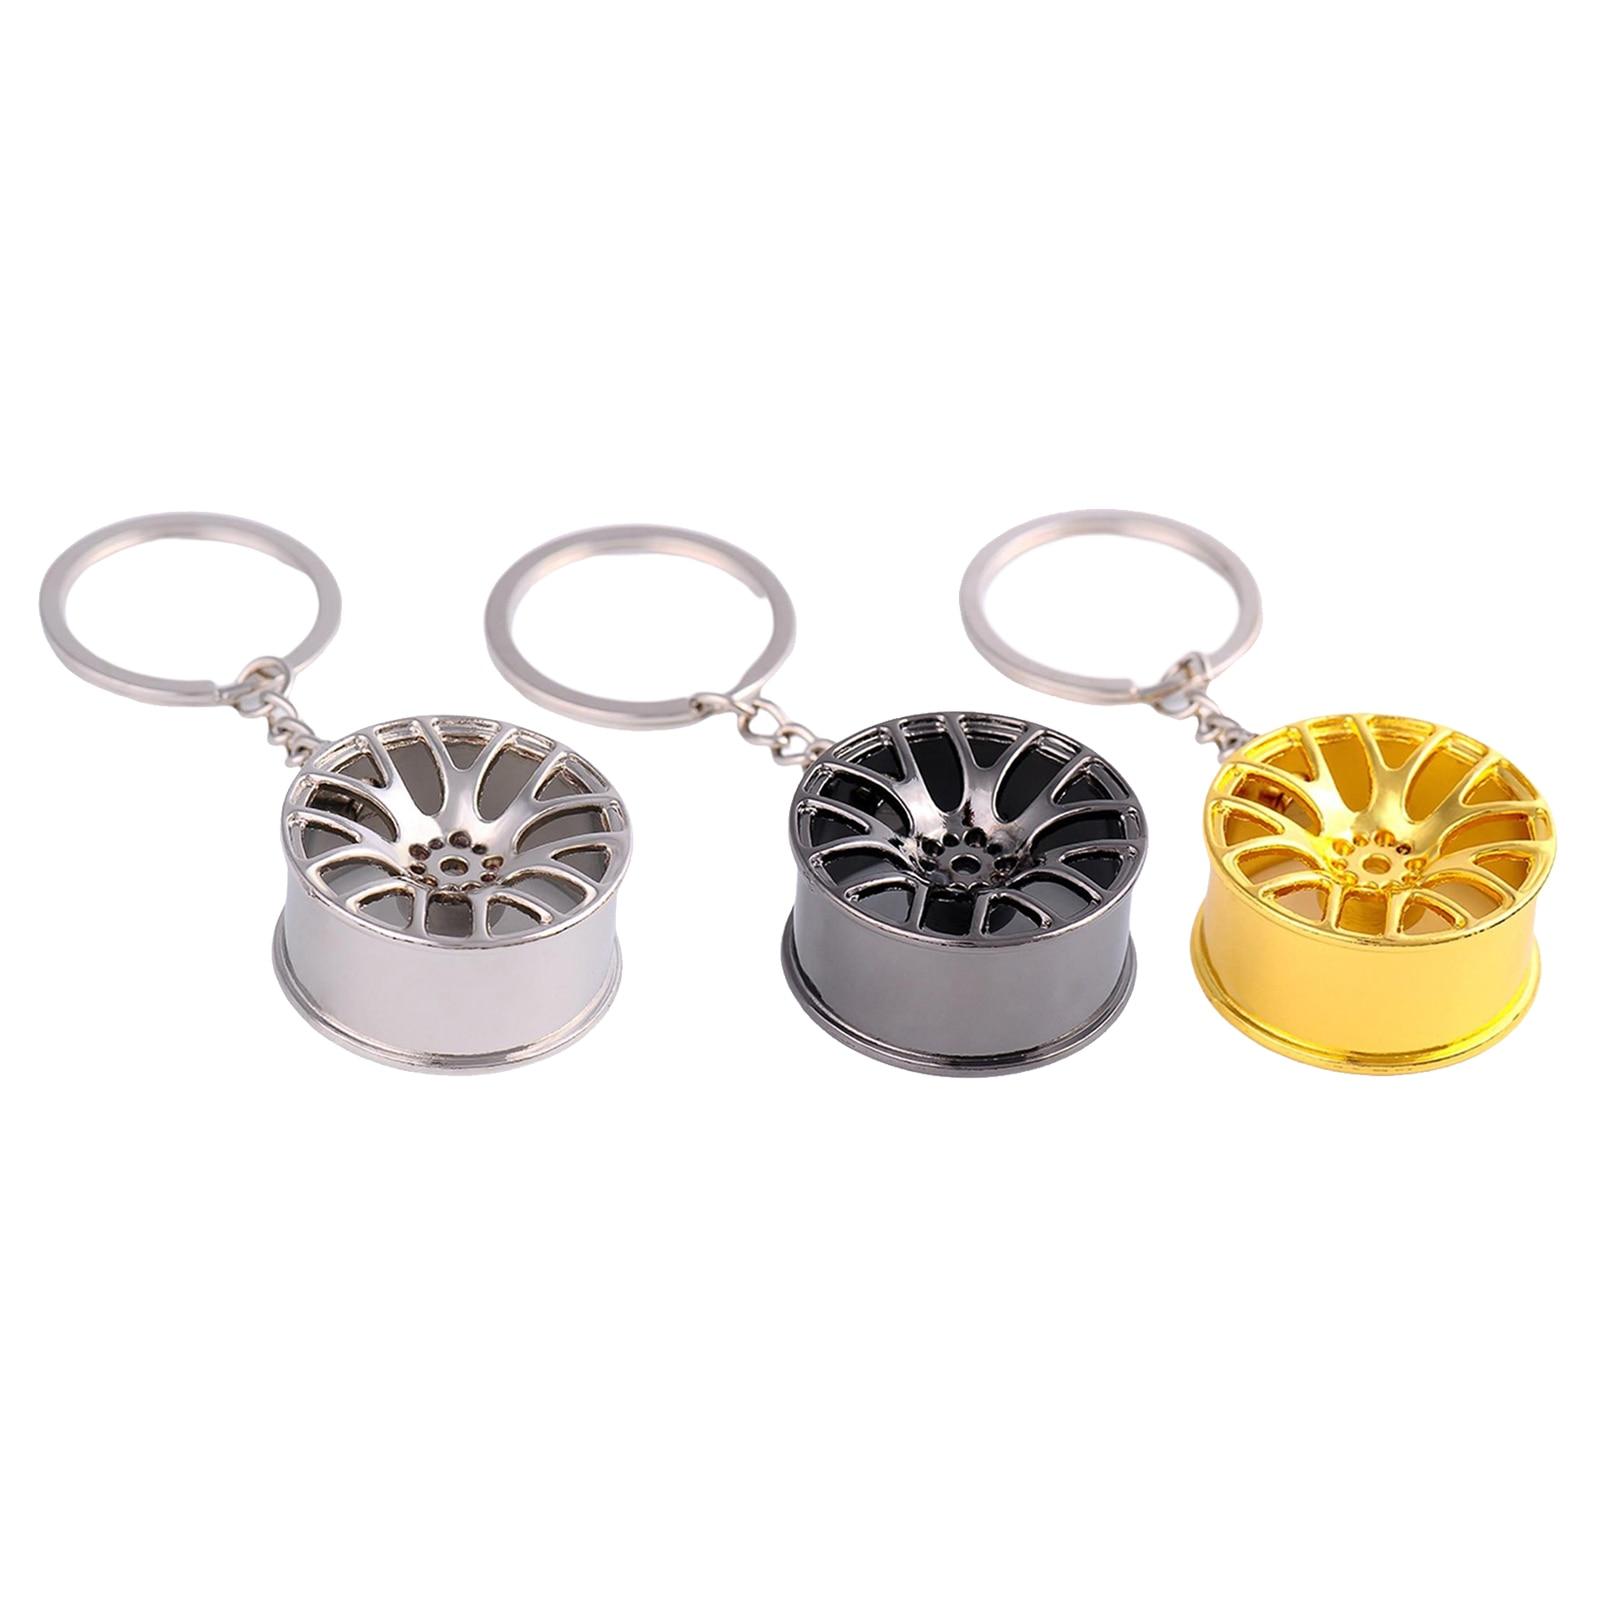 Creative Alloy Wheel Rim Keychain Auto Car Bag Keyring Pendant Ornament for Woman Man Gift